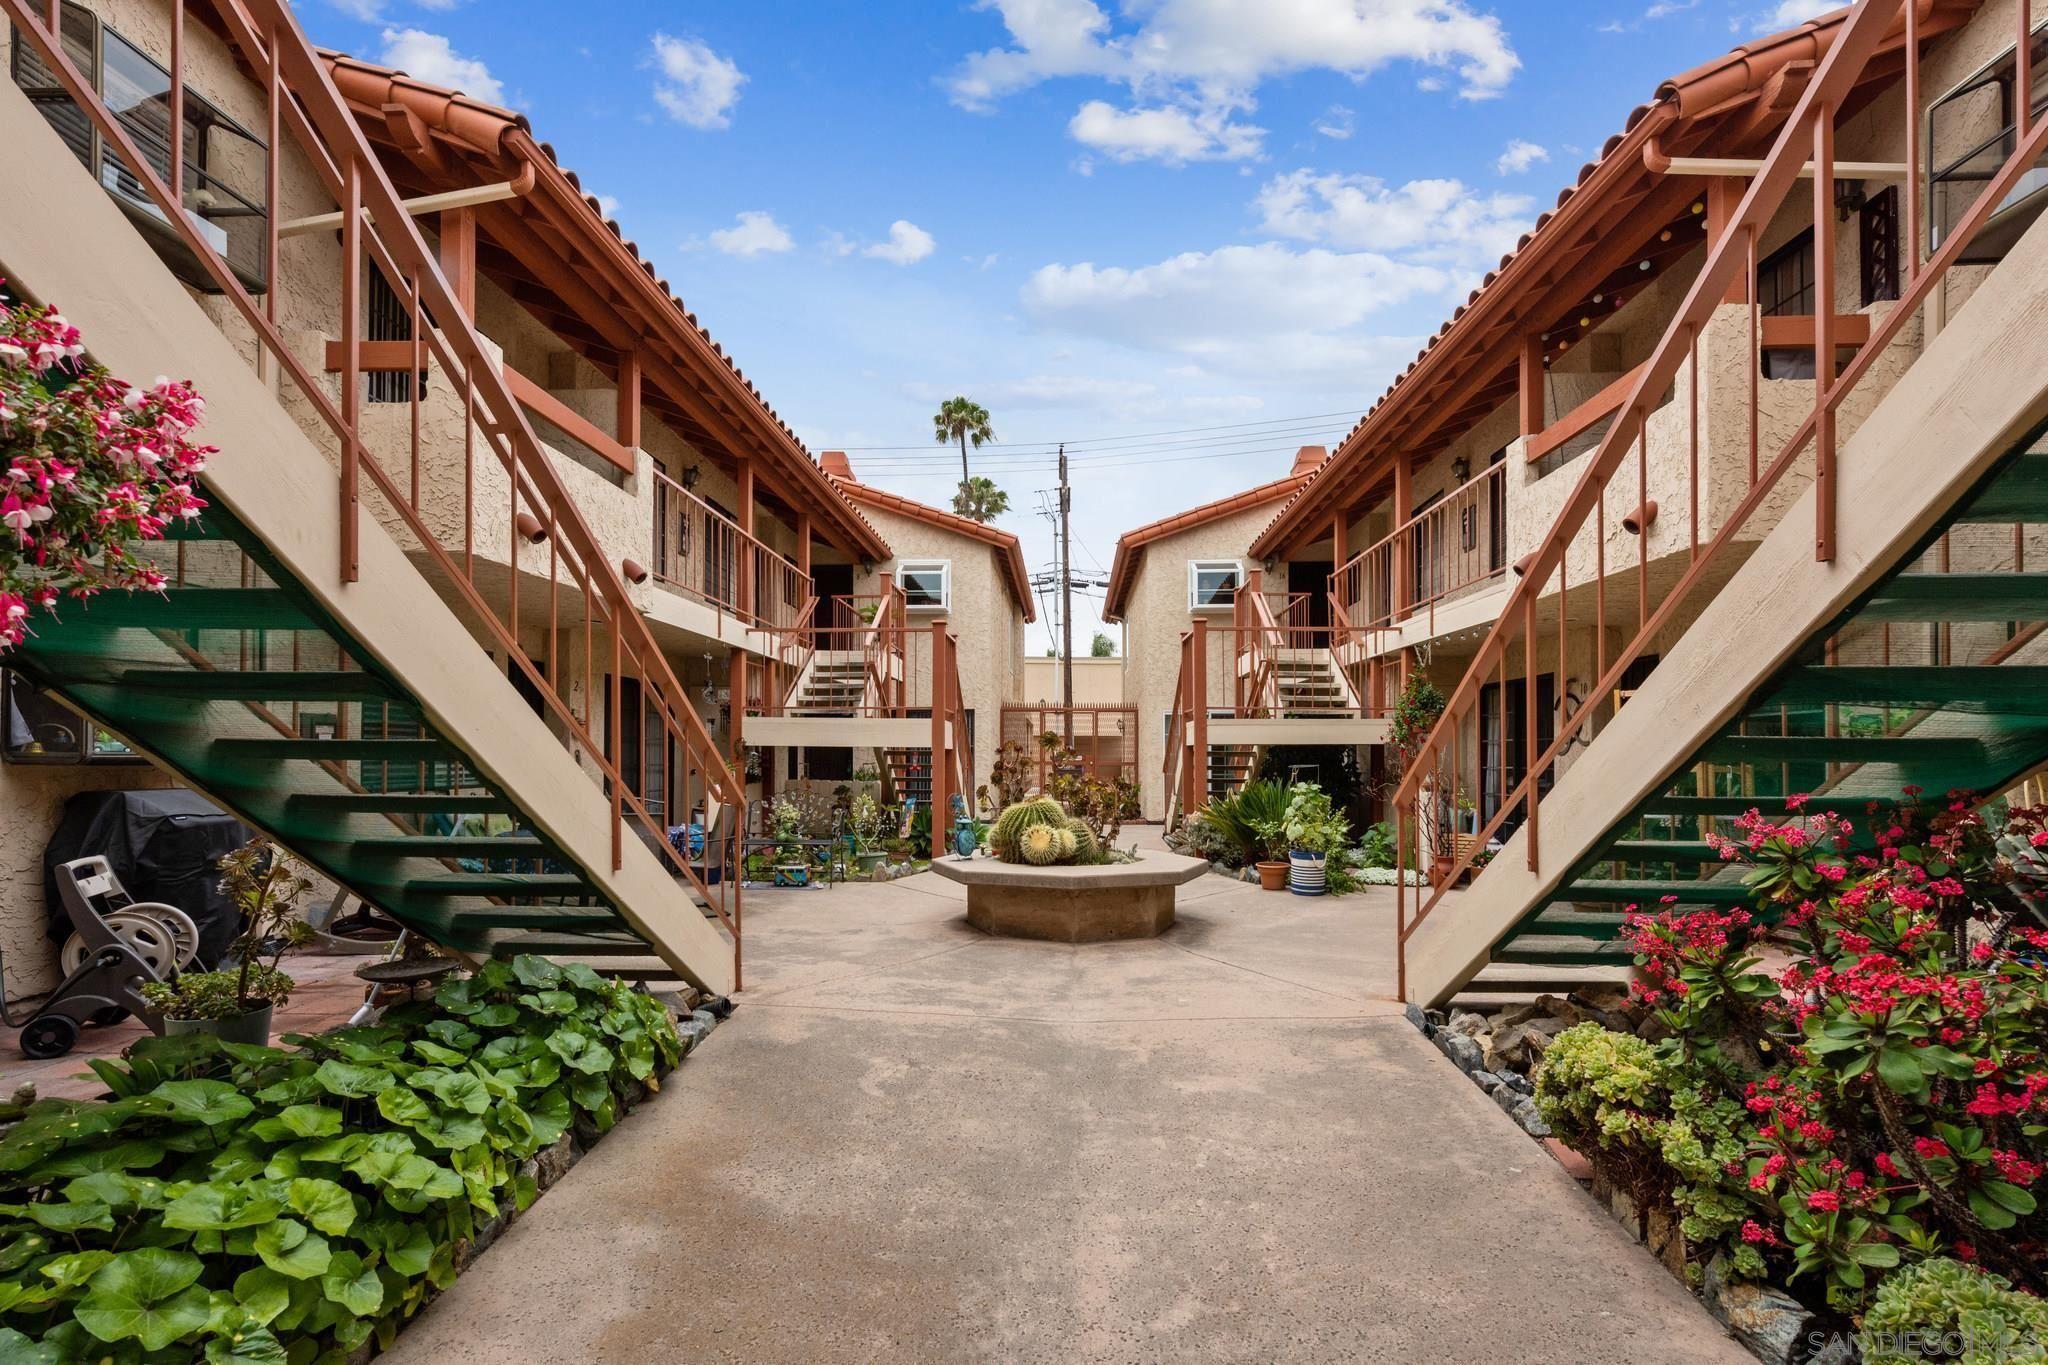 Main Photo: NORTH PARK Condo for sale : 2 bedrooms : 3988 Iowa #9 in San Diego